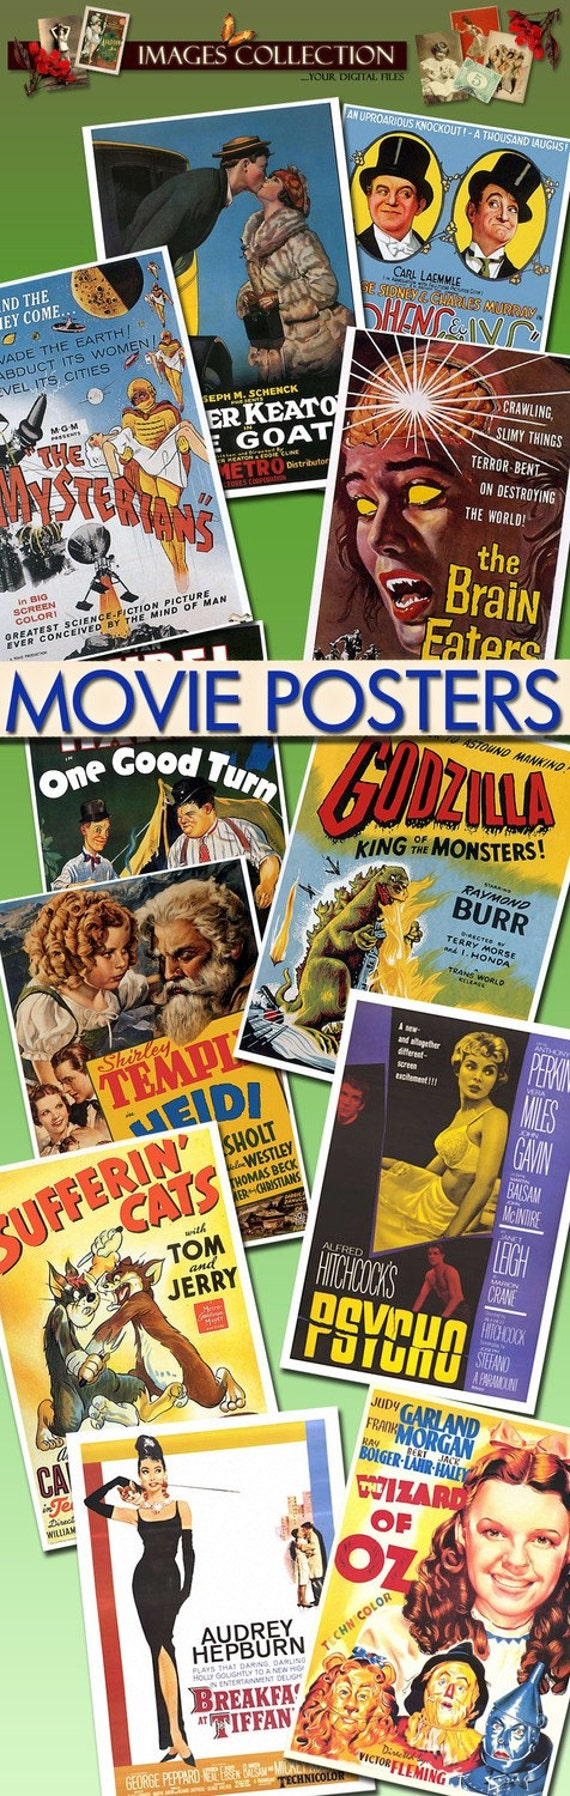 Digital collection images Movie Posters -Part.1- 700 Jpeg files scrap cards labels art cinema actors actresses vintage film posters / C121